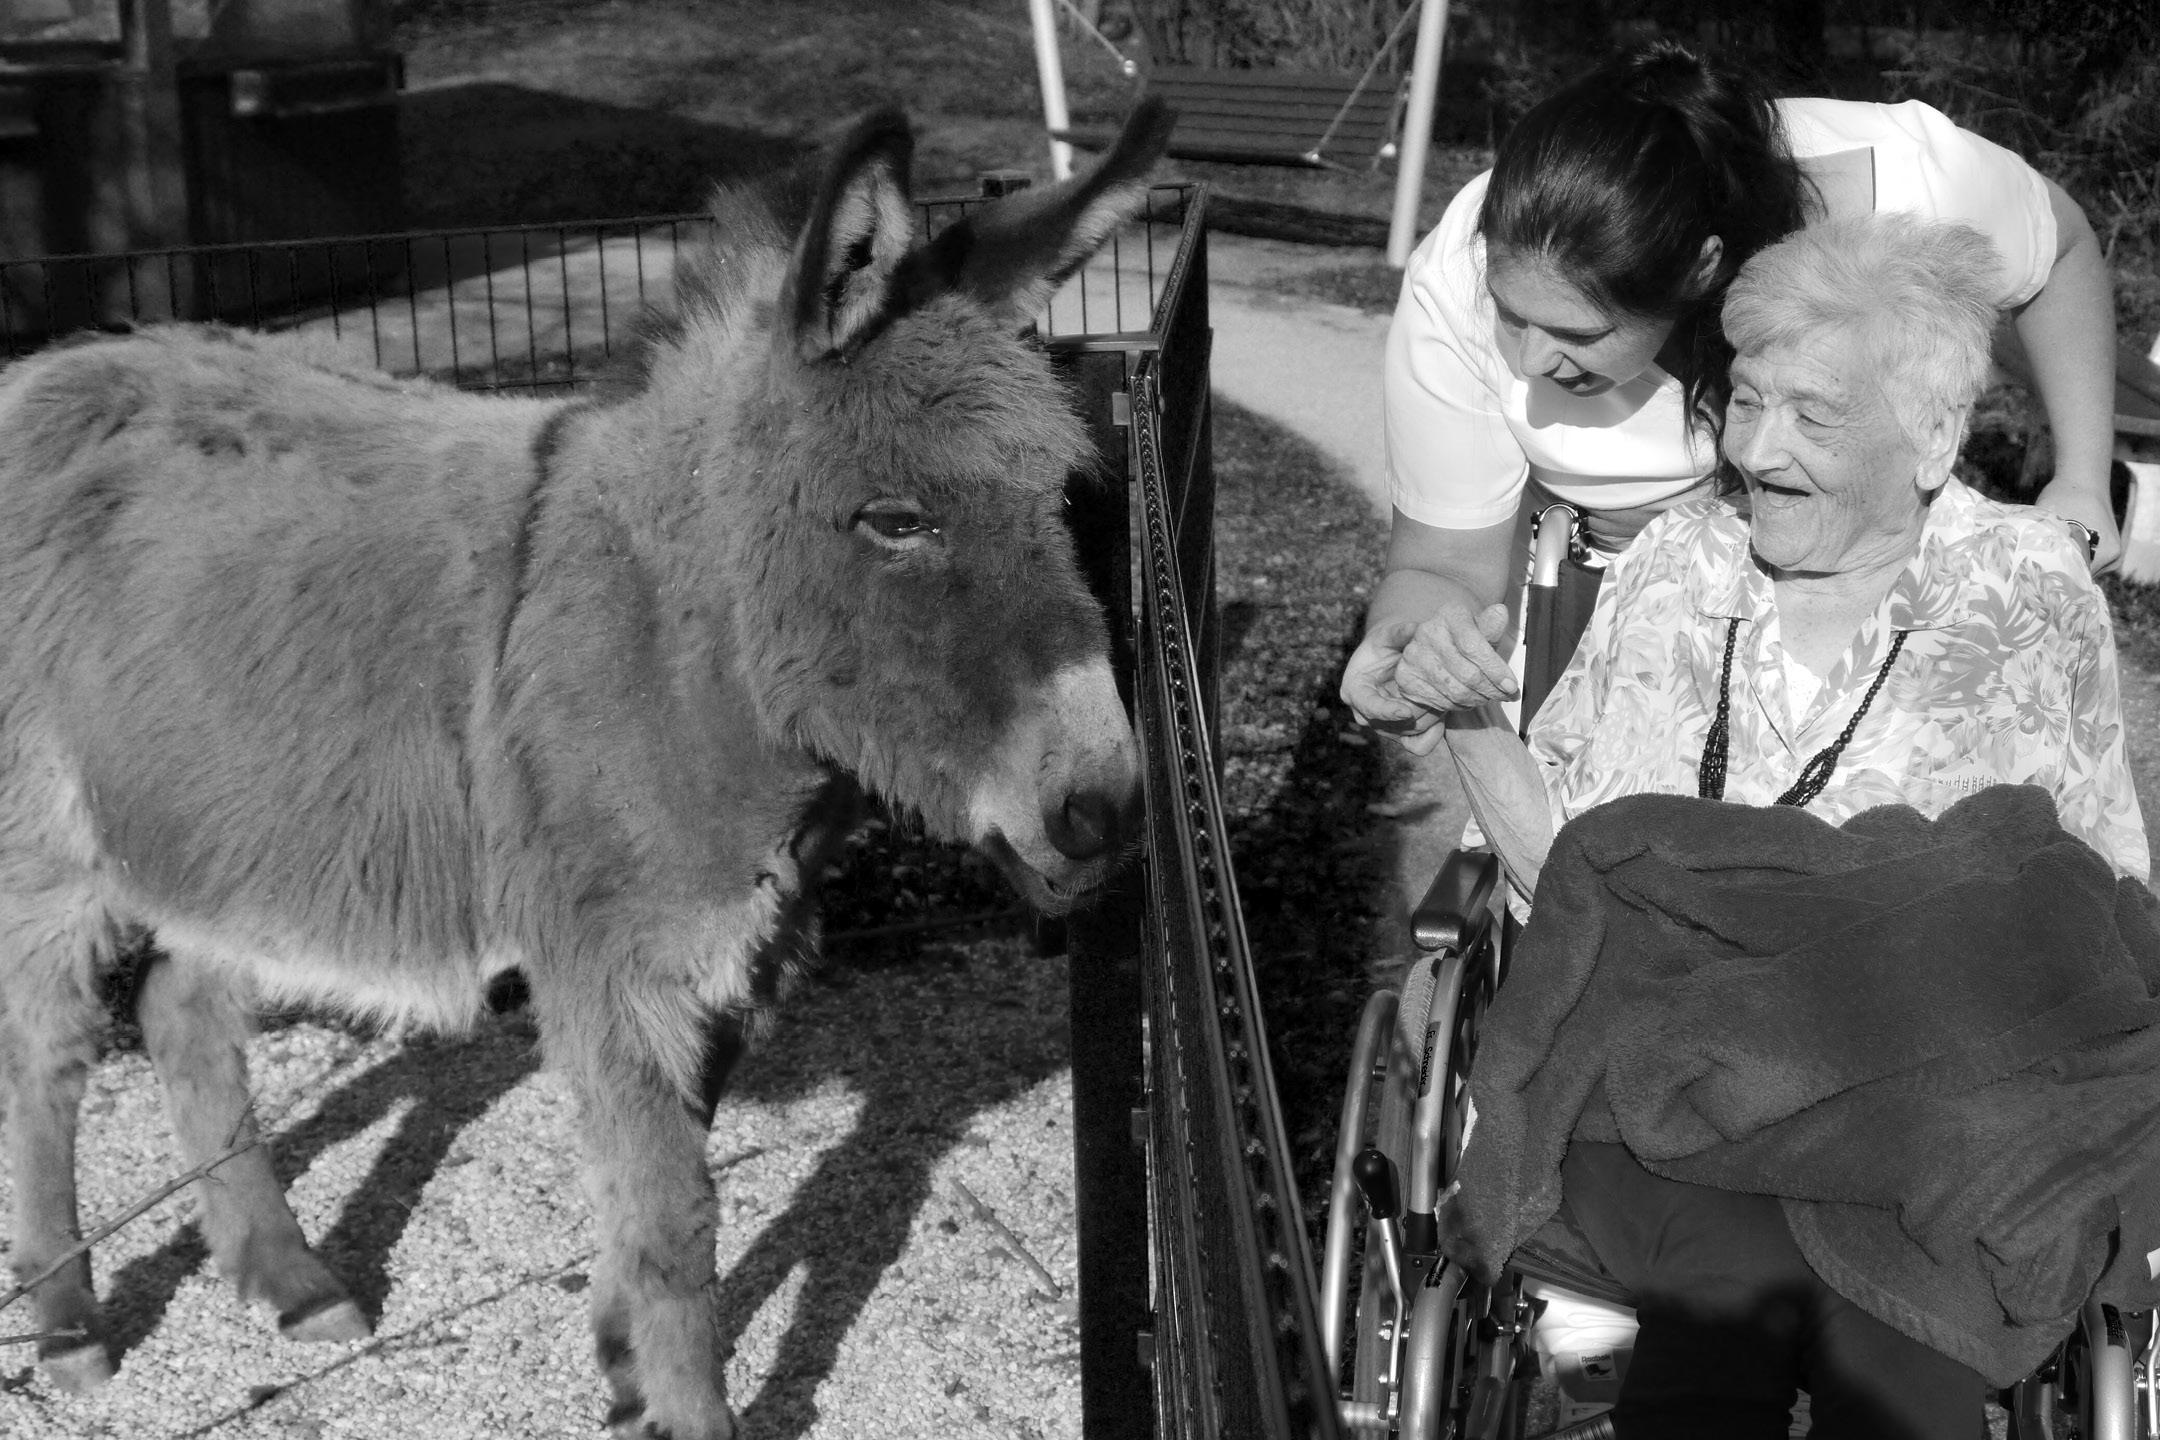 Retla_02A Projekt - Seniorin mit Esel